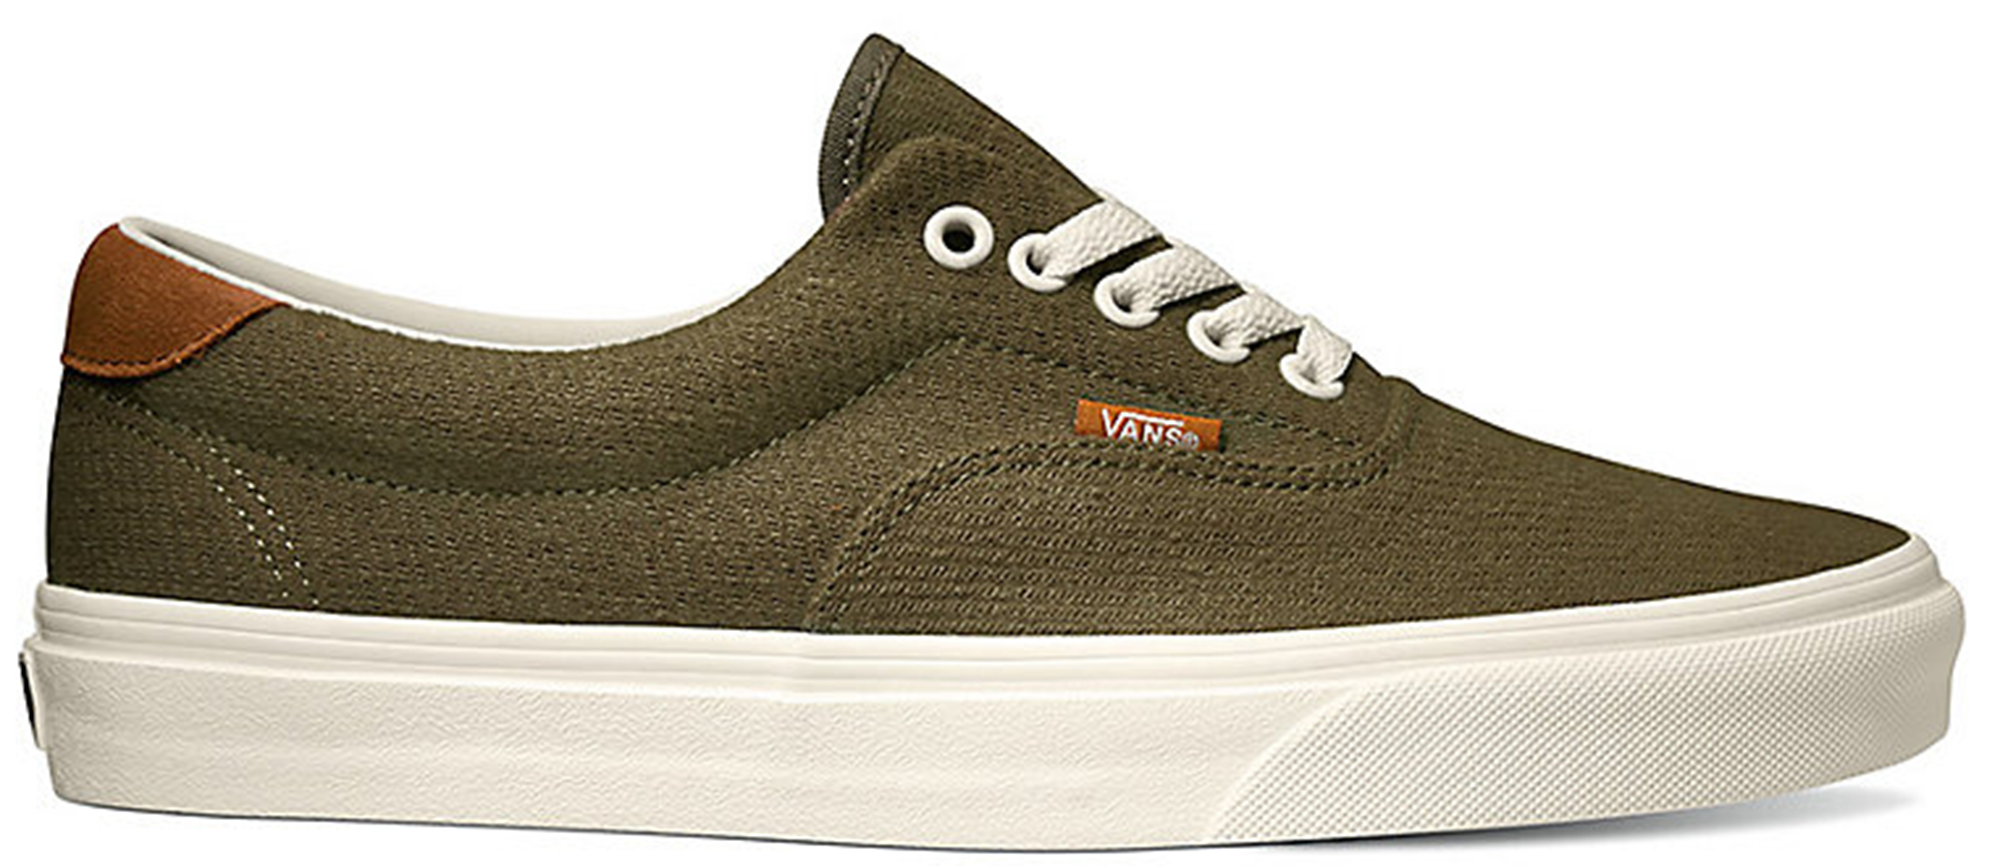 Vans Era 59 Flannel Olive - VN0A38FSU4N